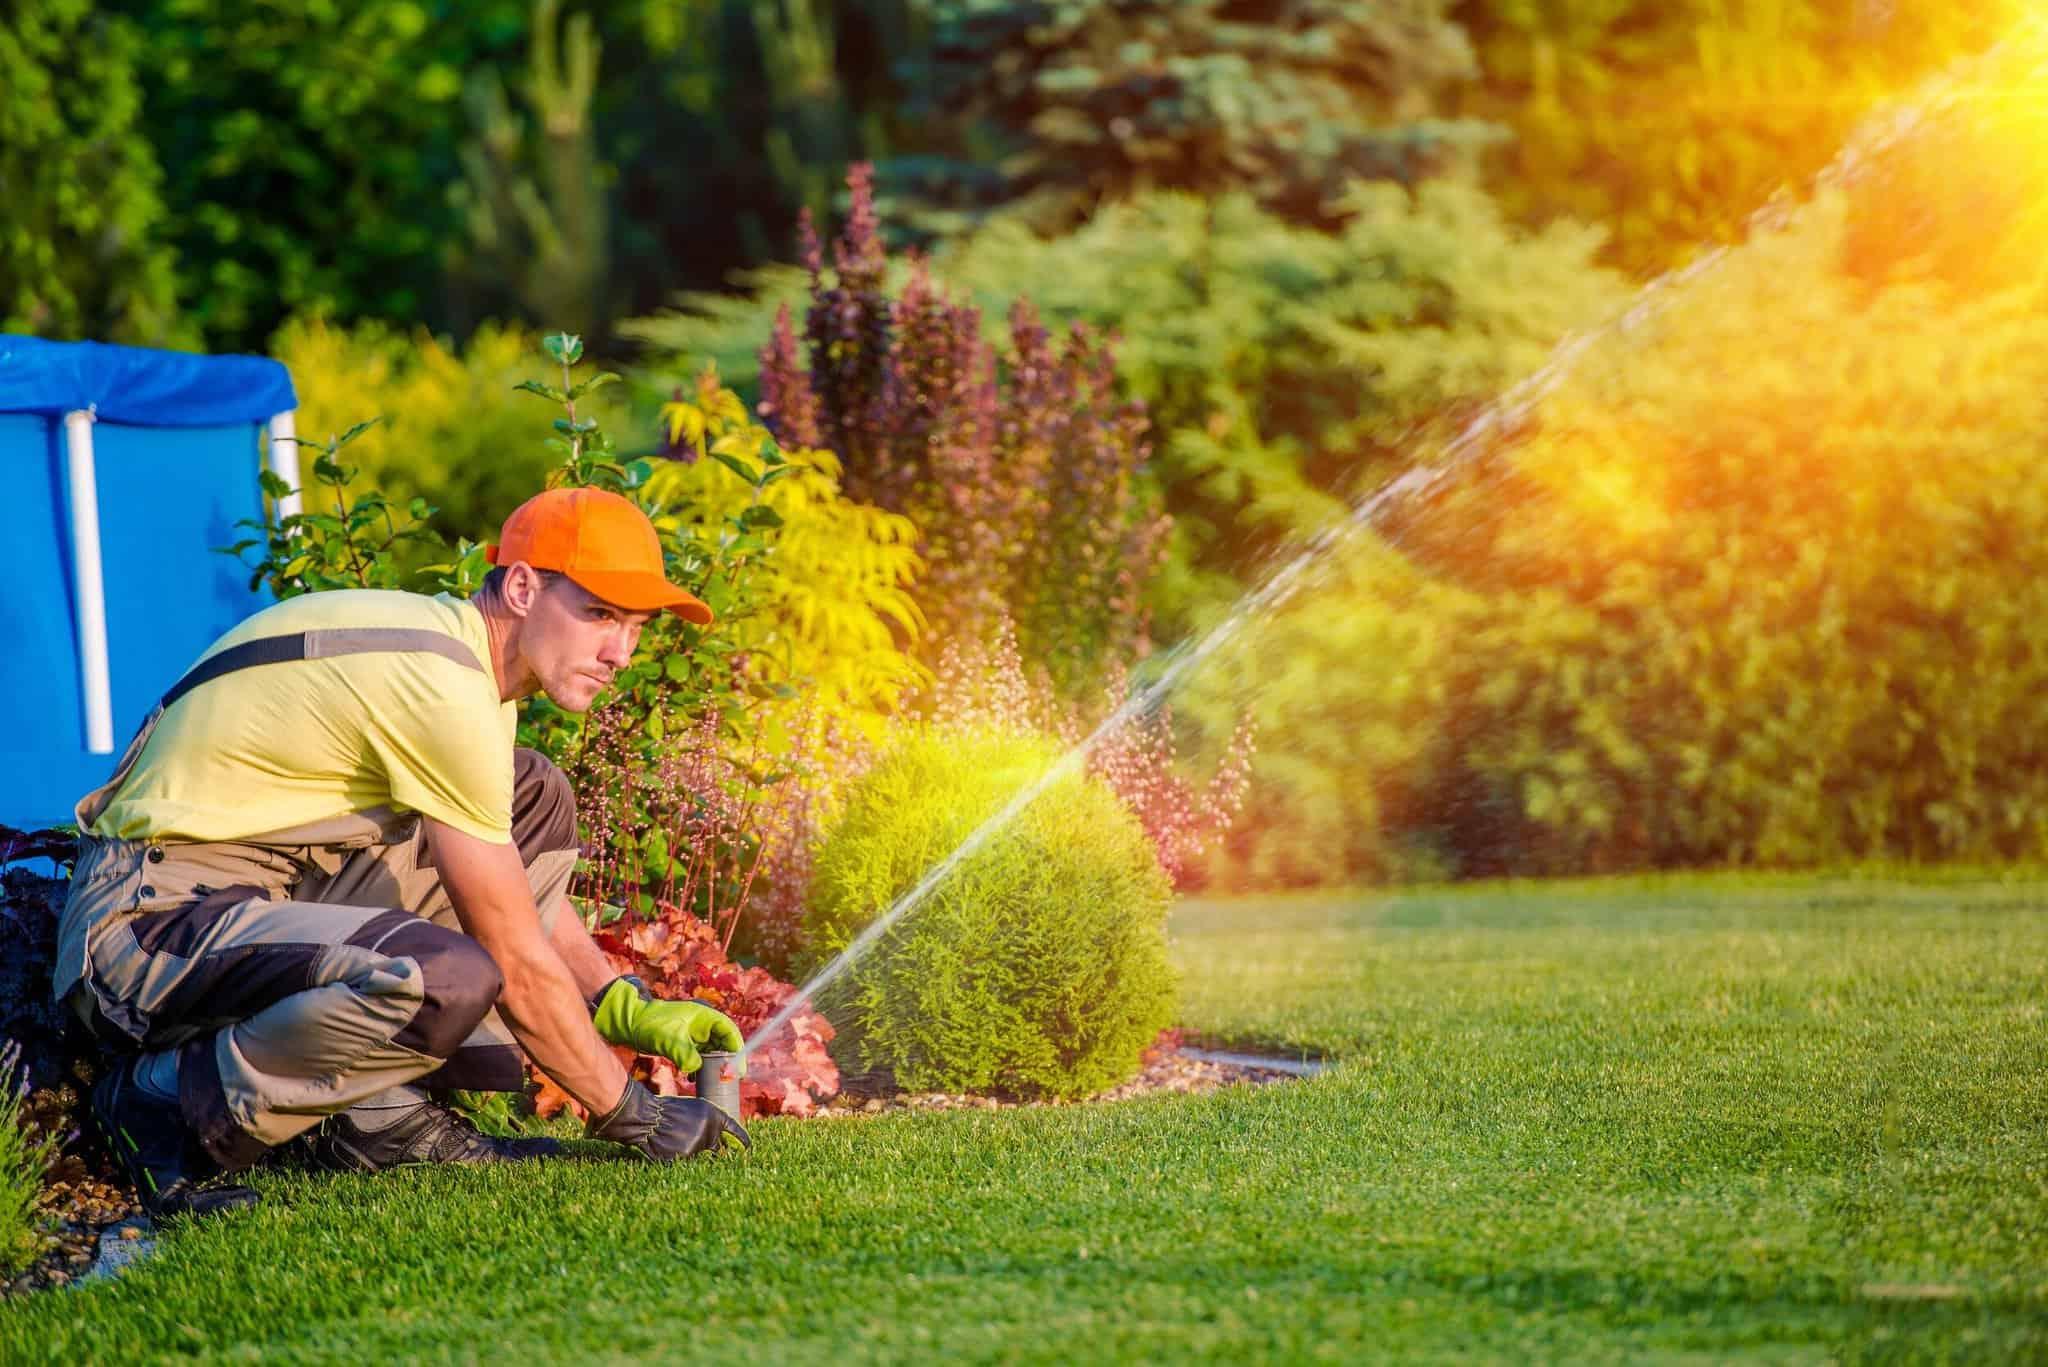 rsz how to clean garden sprinklers 1shutterstockcom